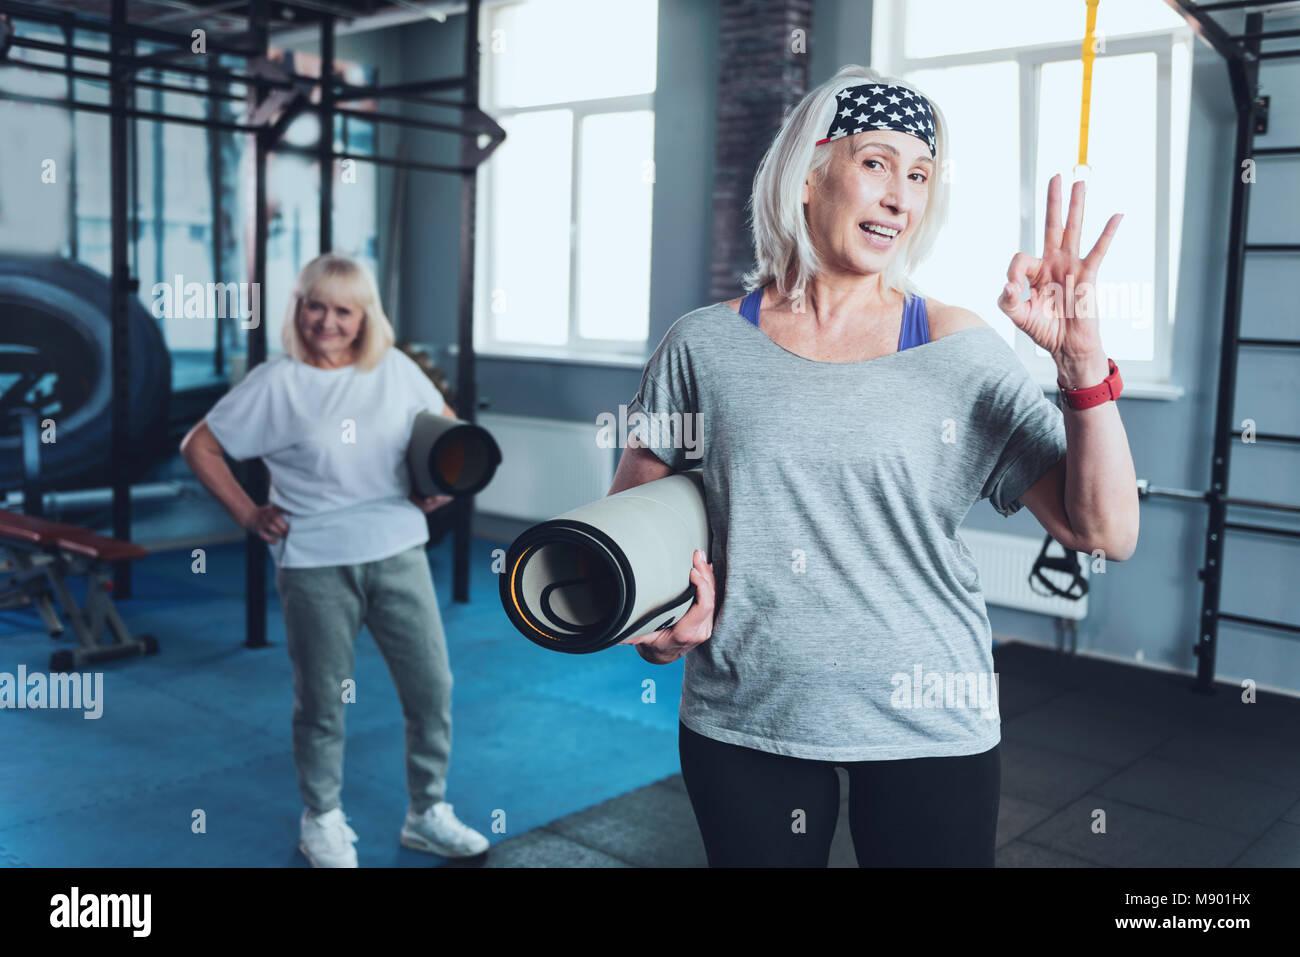 Gym sign stock photos gym sign stock images alamy positive senior woman gesturing ok sign at gym stock image buycottarizona Choice Image